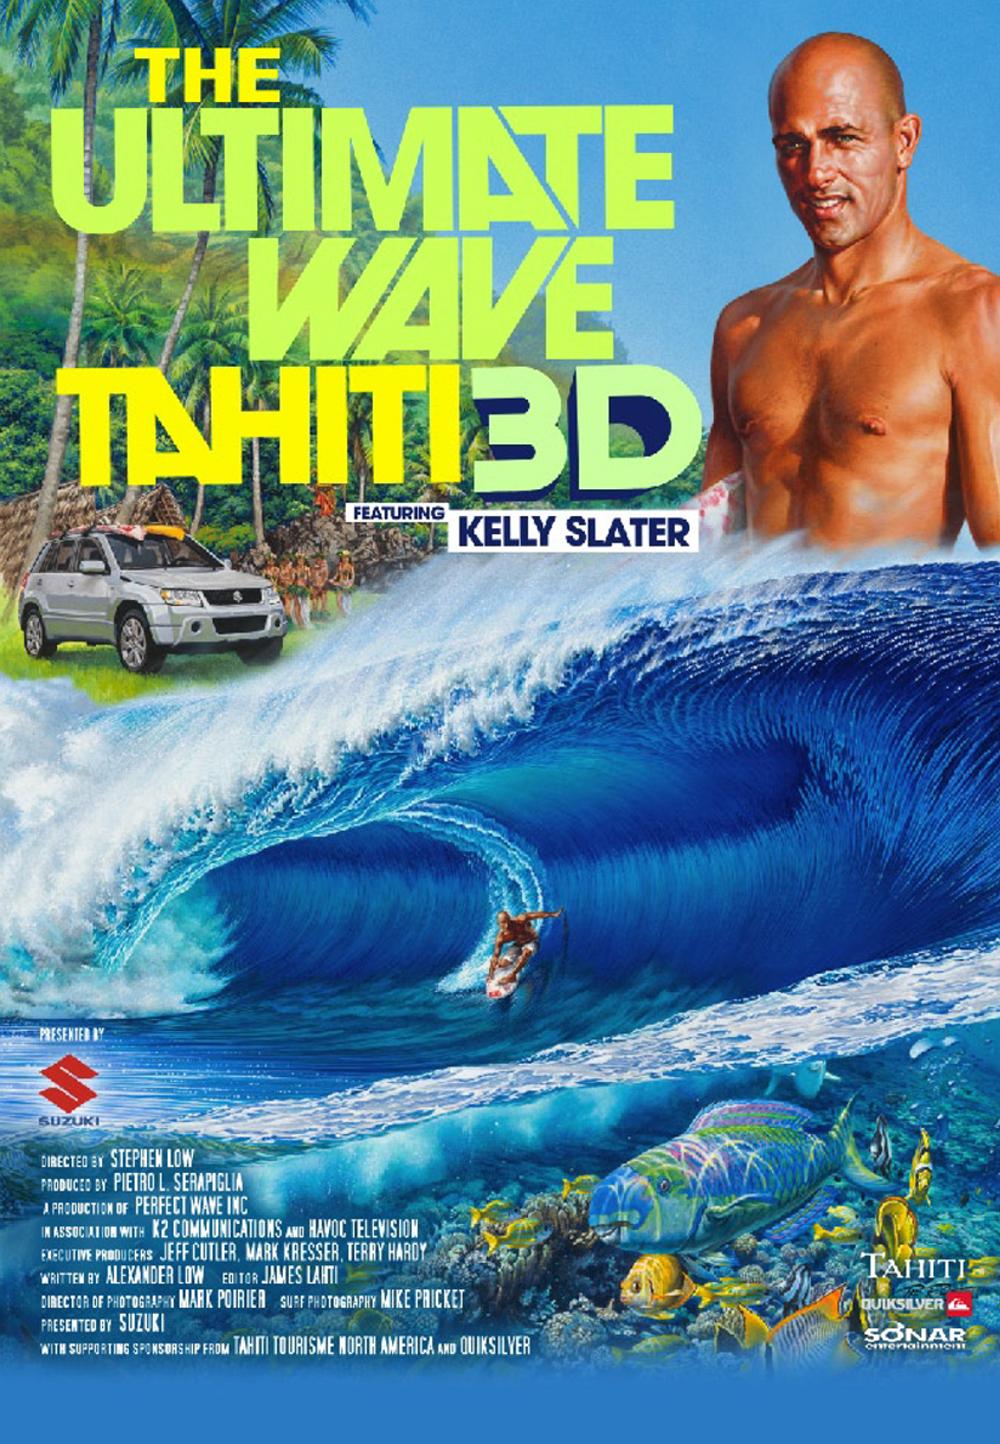 ultimatewave3d.png